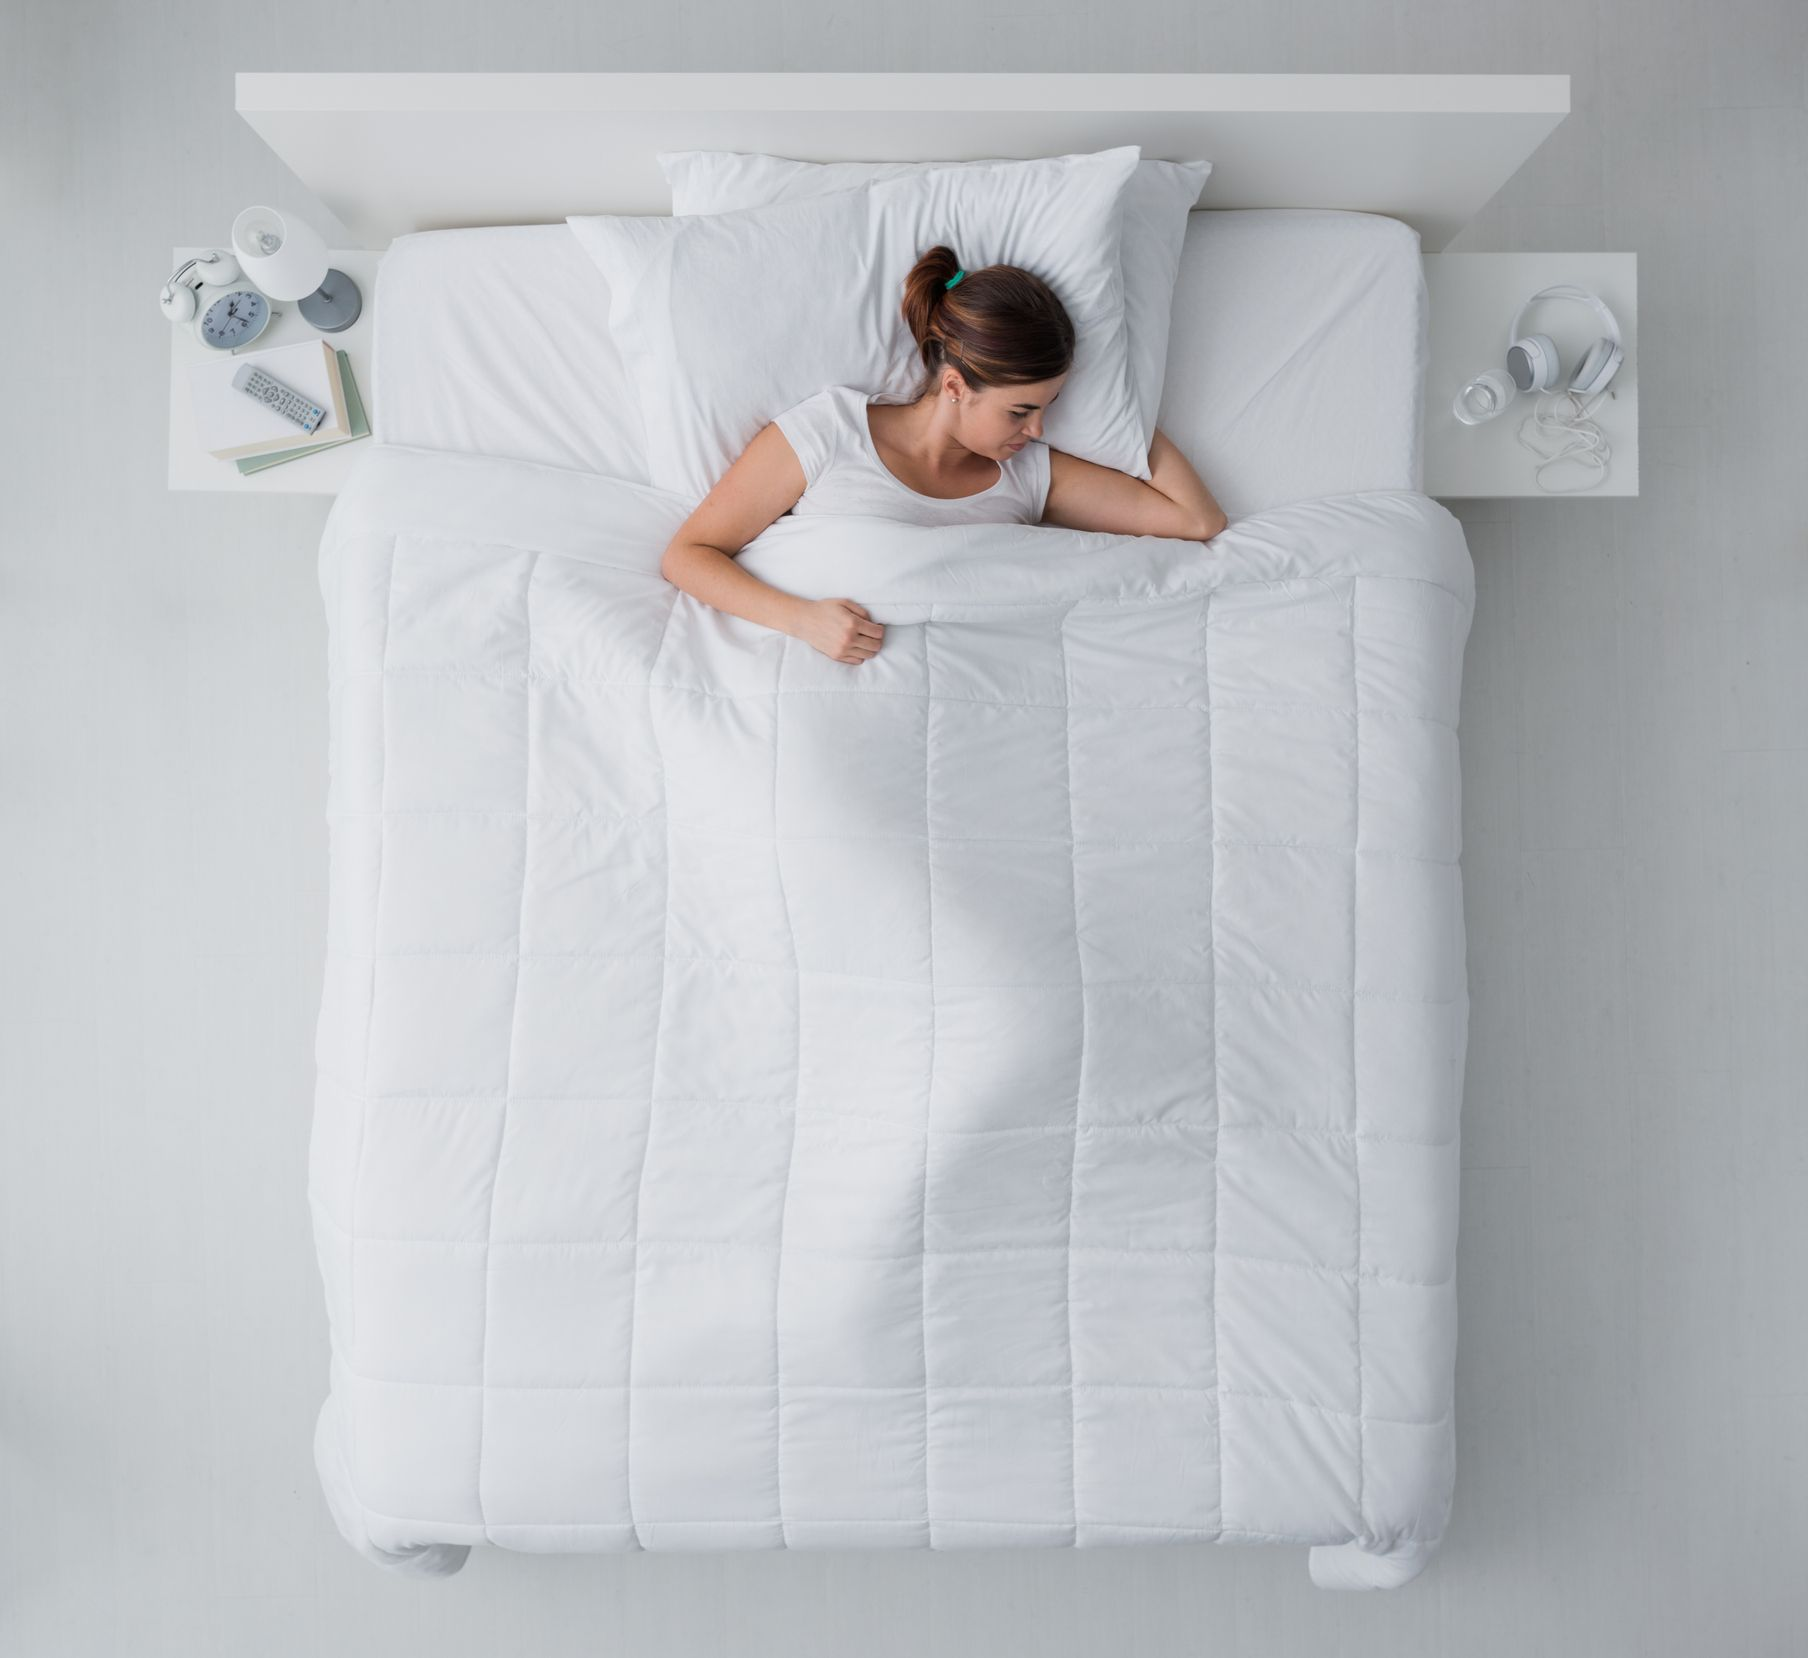 sleep bed getty stock